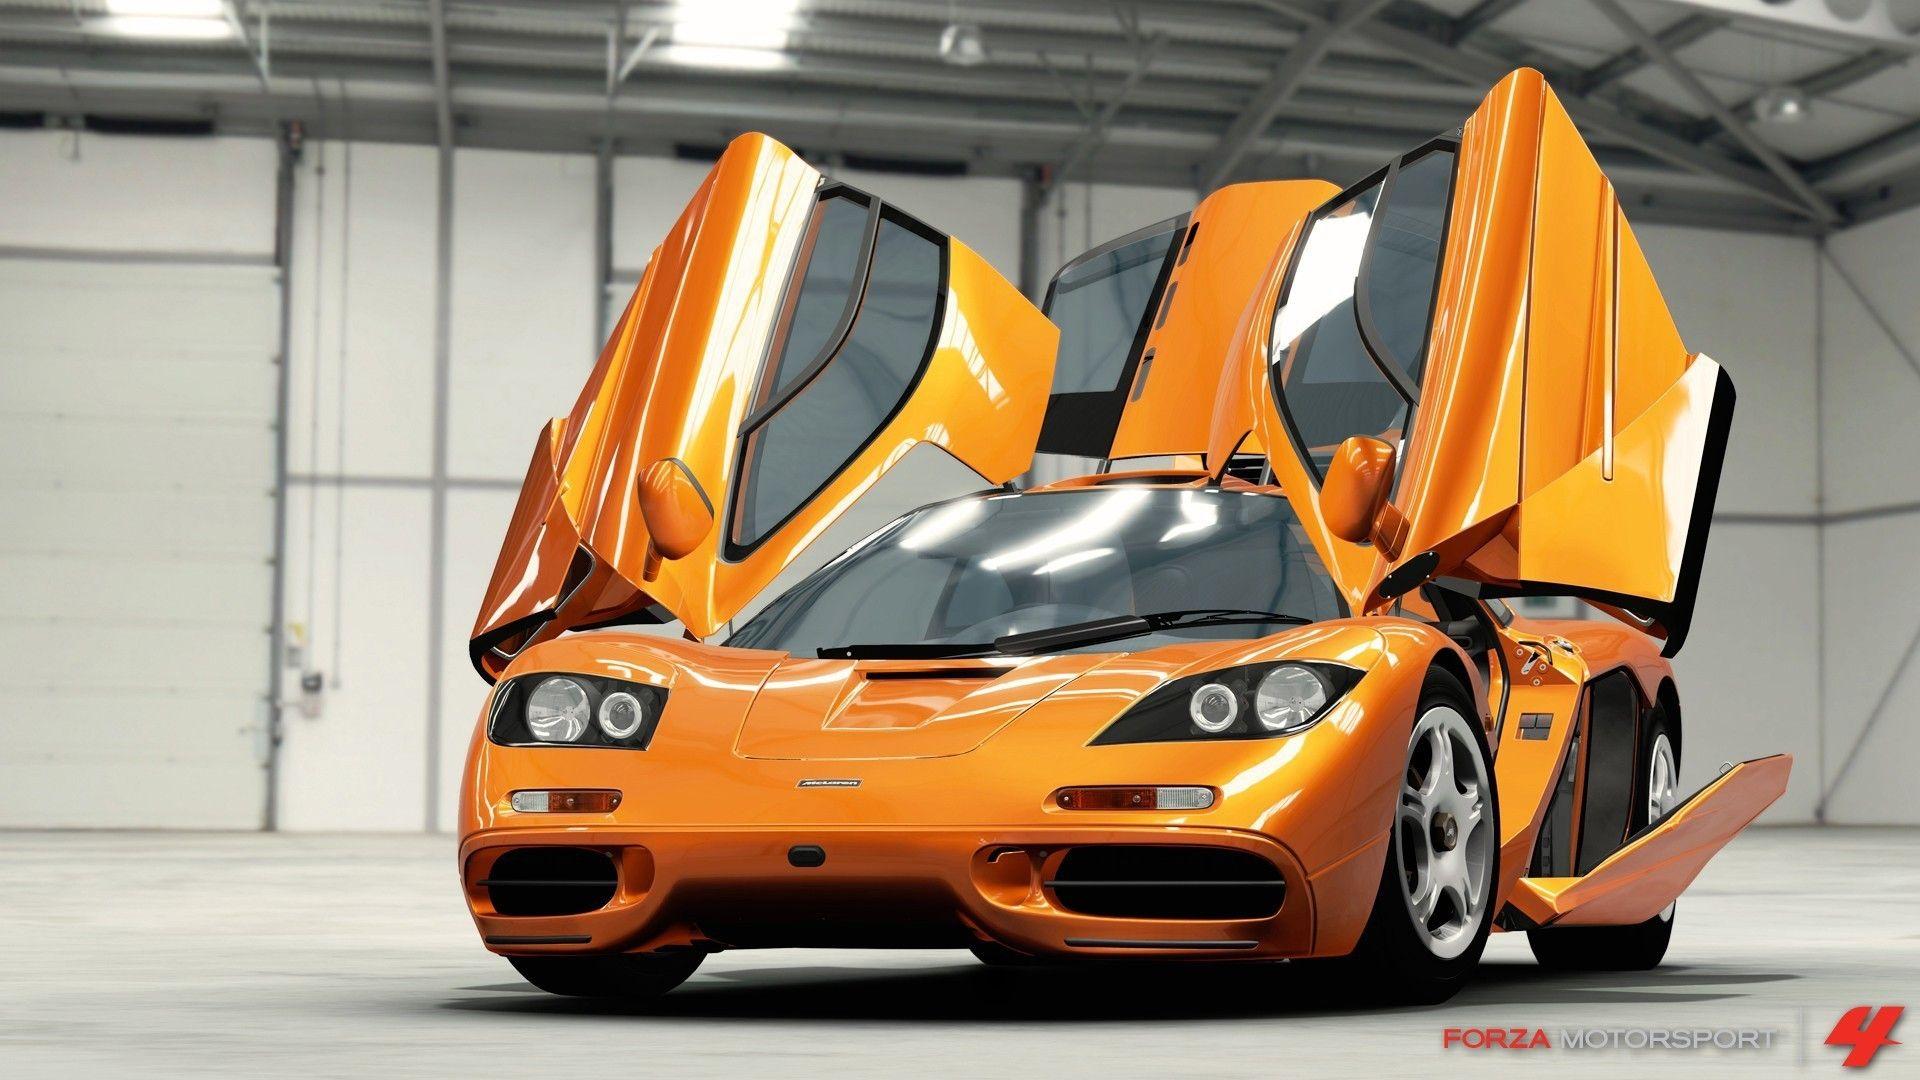 4 Mclaren F1 Xbox 360 Cars Vehicles Wallpaper Forza Motorsport Desktop Themes Mclaren F1 Lm